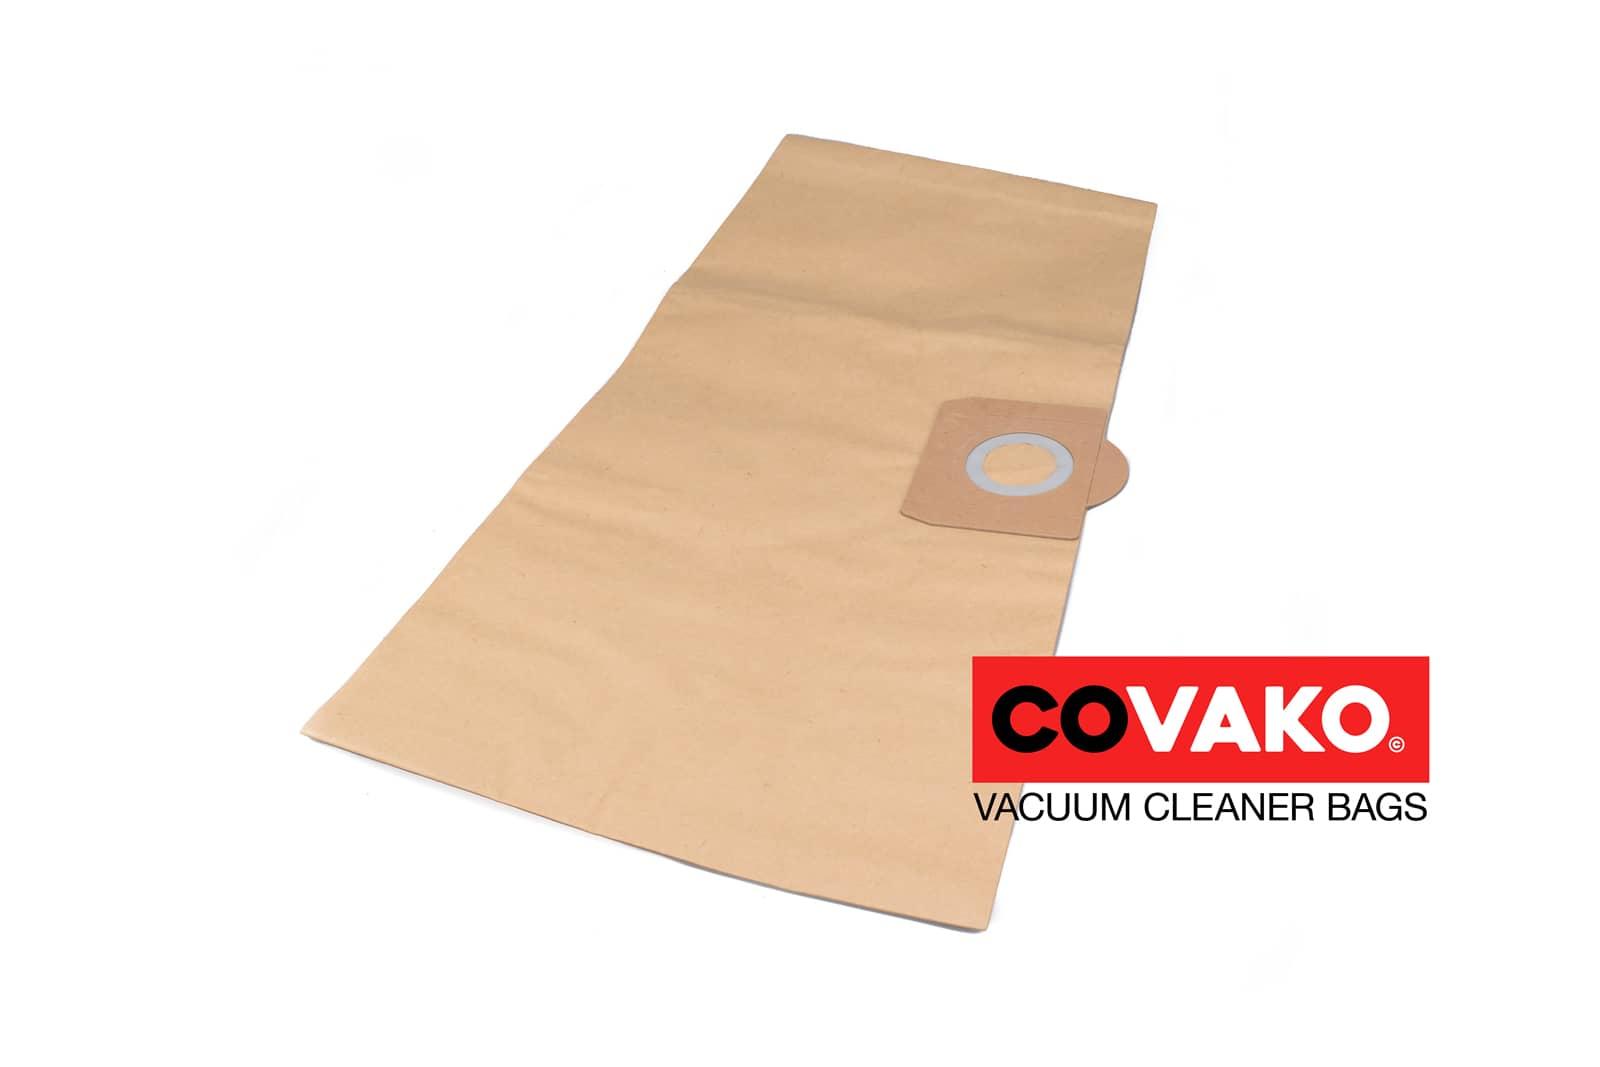 Soteco Dakota Compact 101 Spot / Papier - Soteco Staubsaugerbeutel